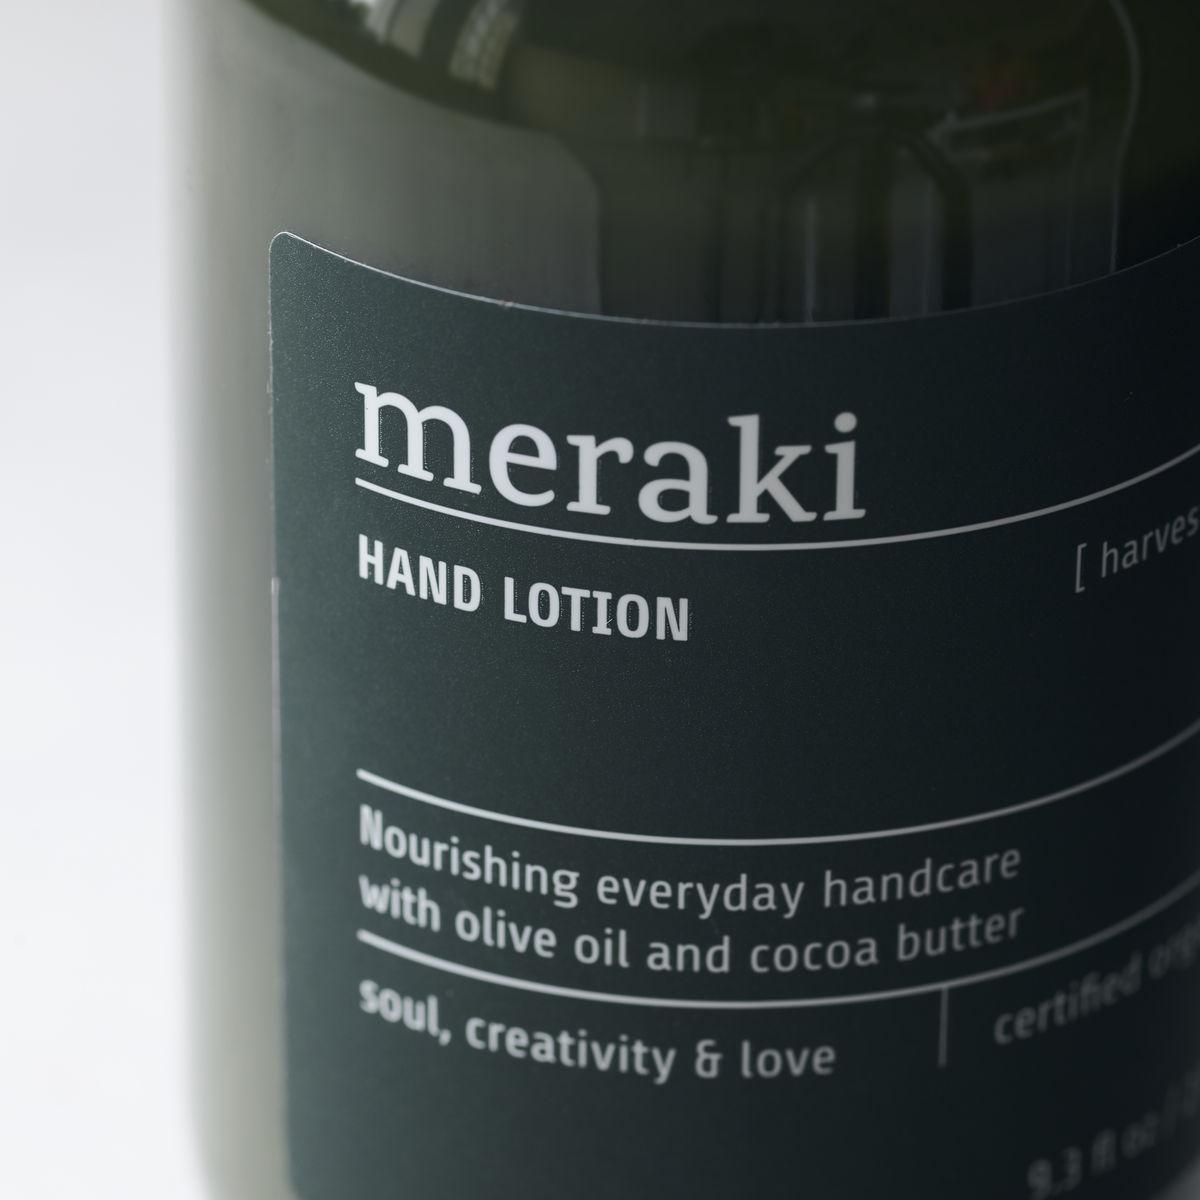 Meraki Hand Lotion